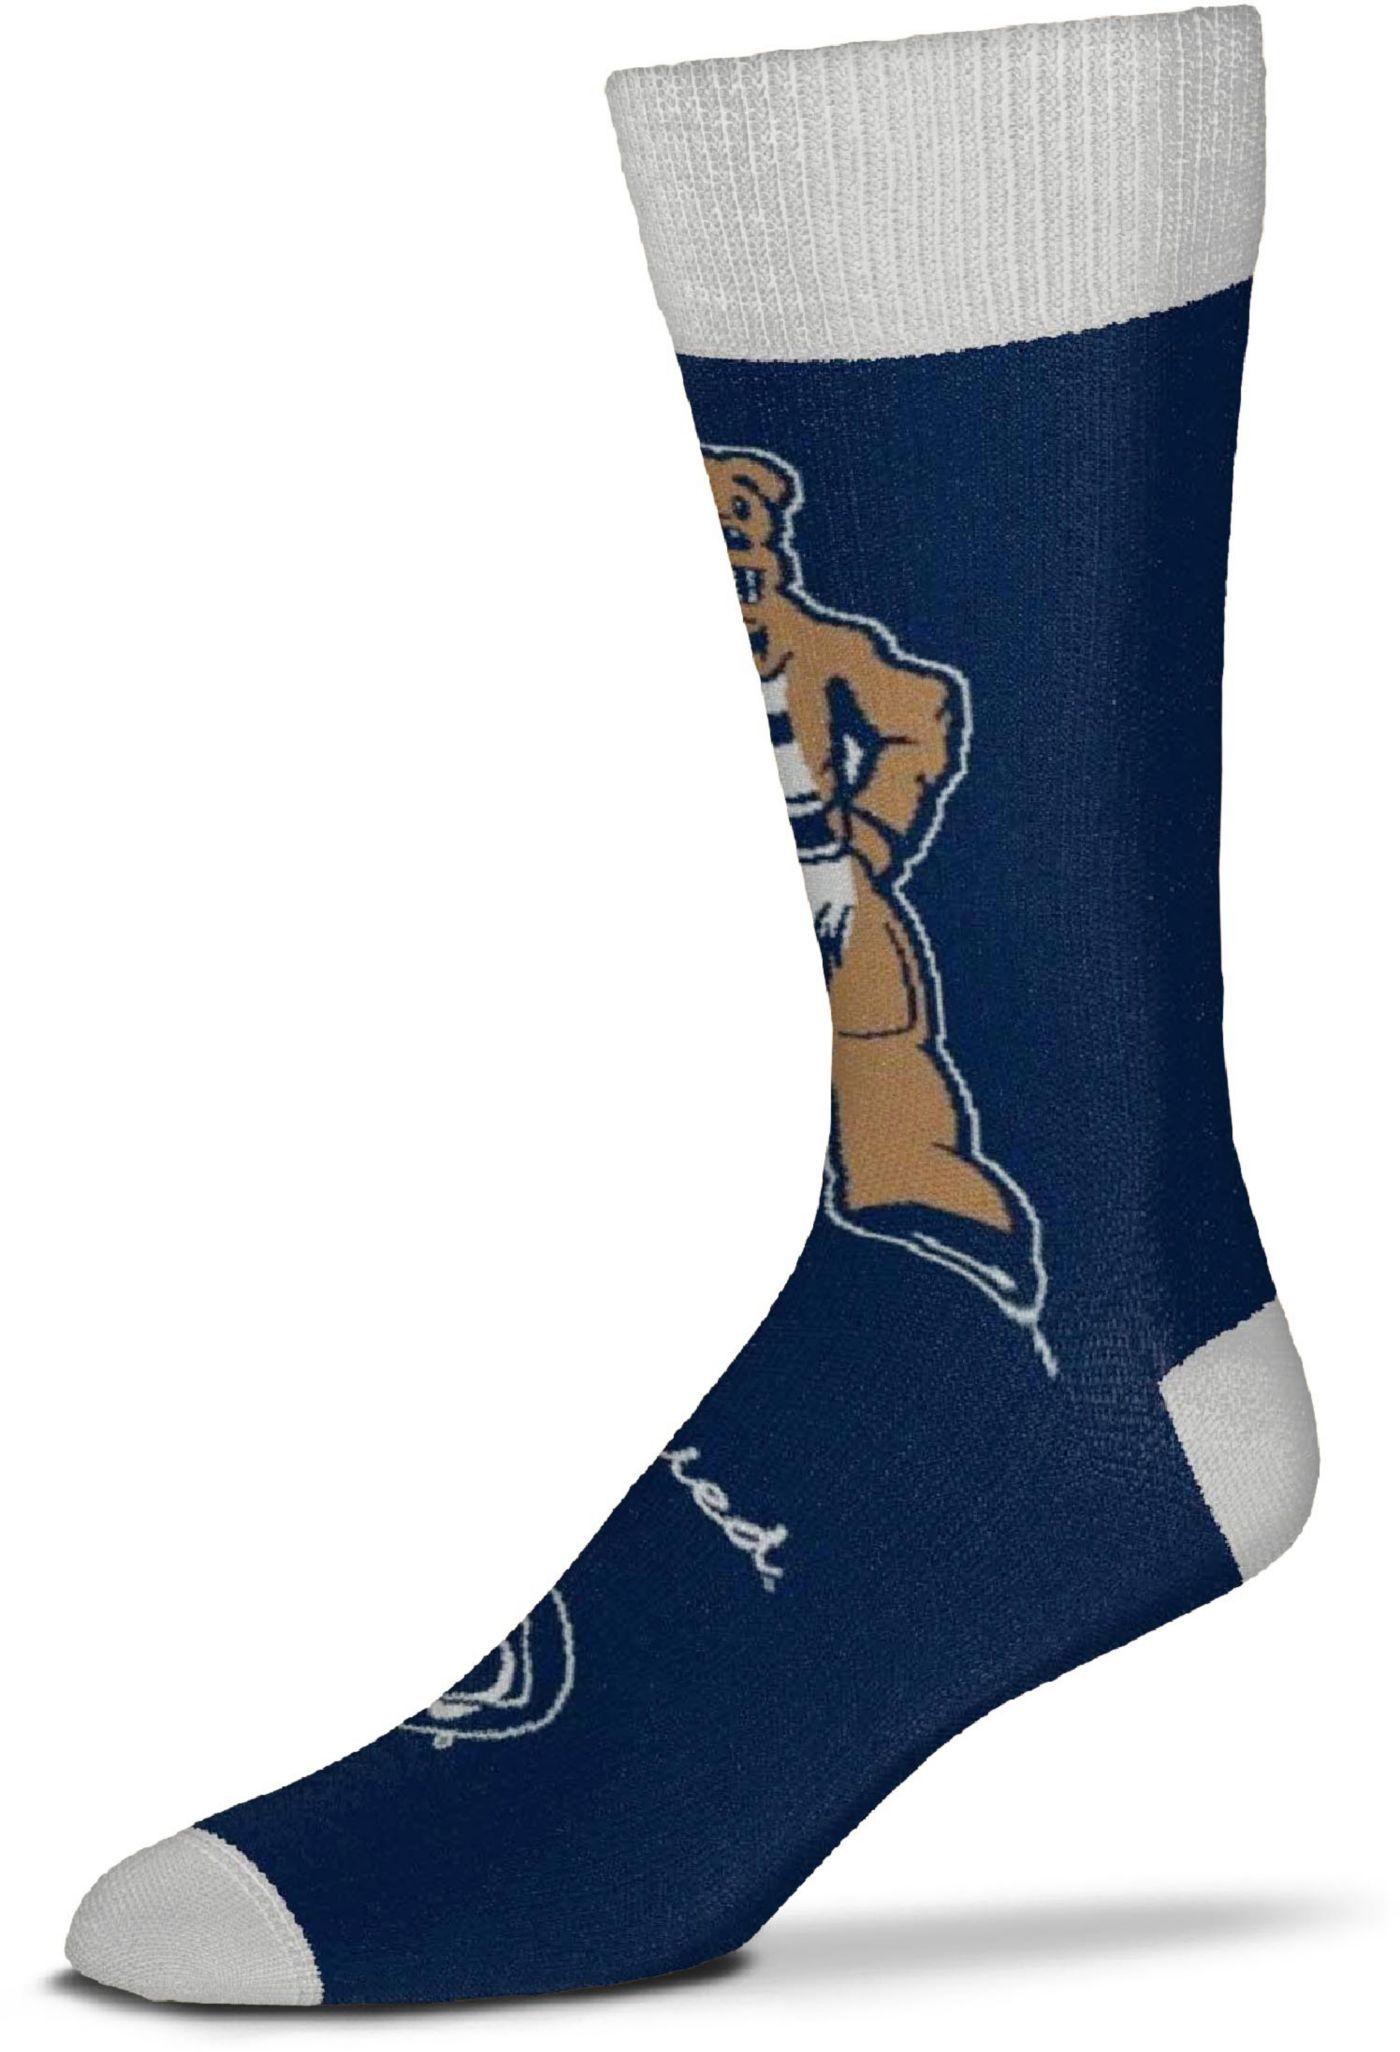 For Bare Feet Penn State Nittany Lions Thin Crew Socks